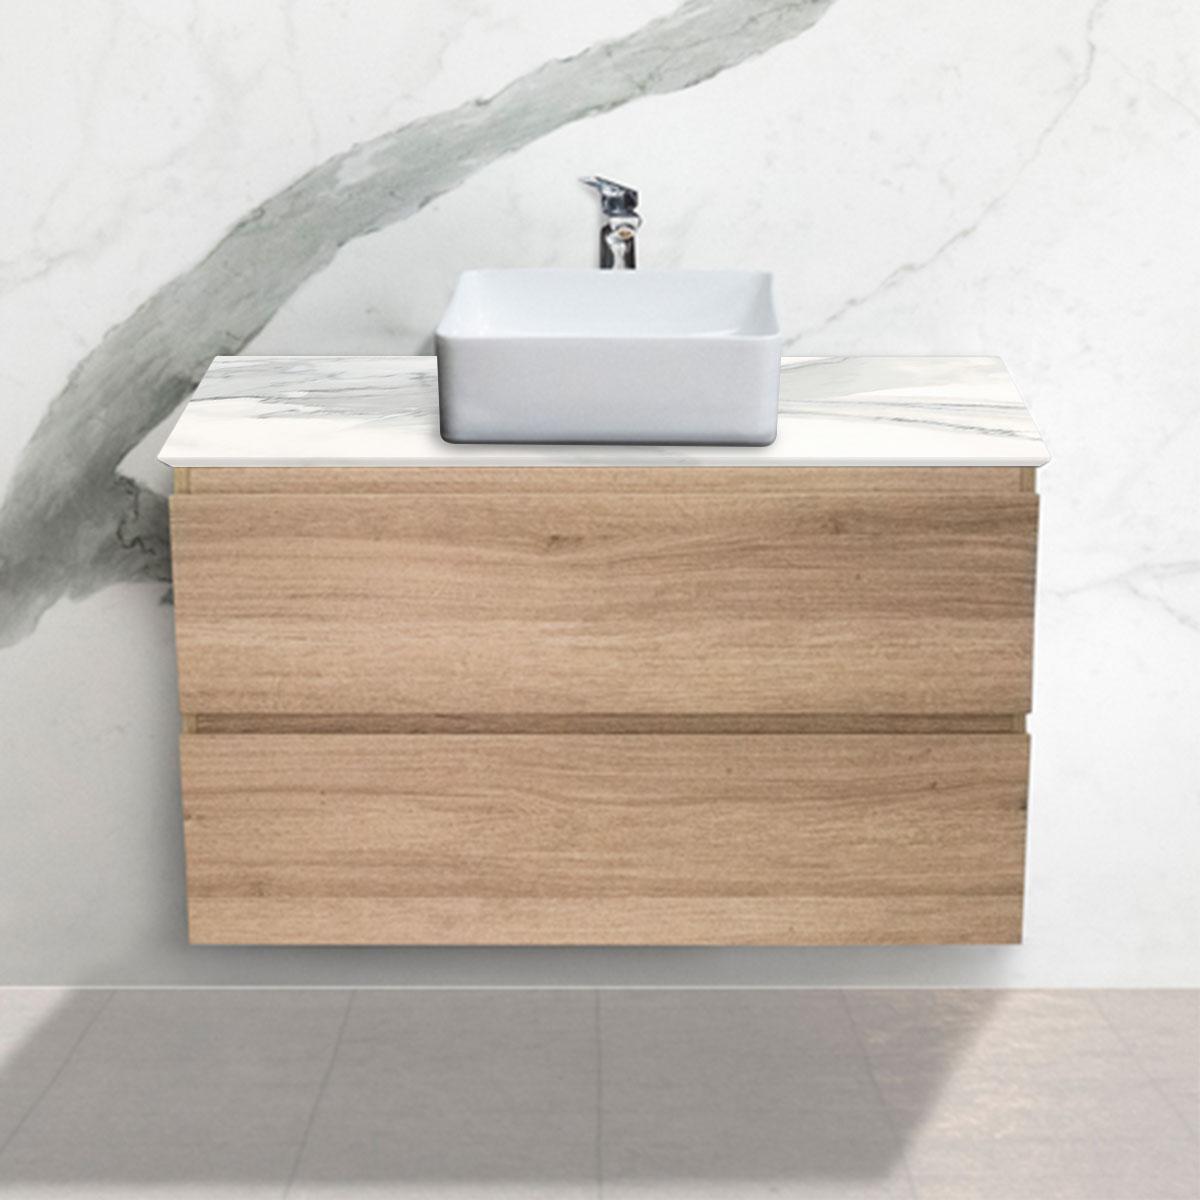 Large Oak Woodgrain Cabinet - Vanity- 2 Drawers - Absolute - Stone3 Brisbane